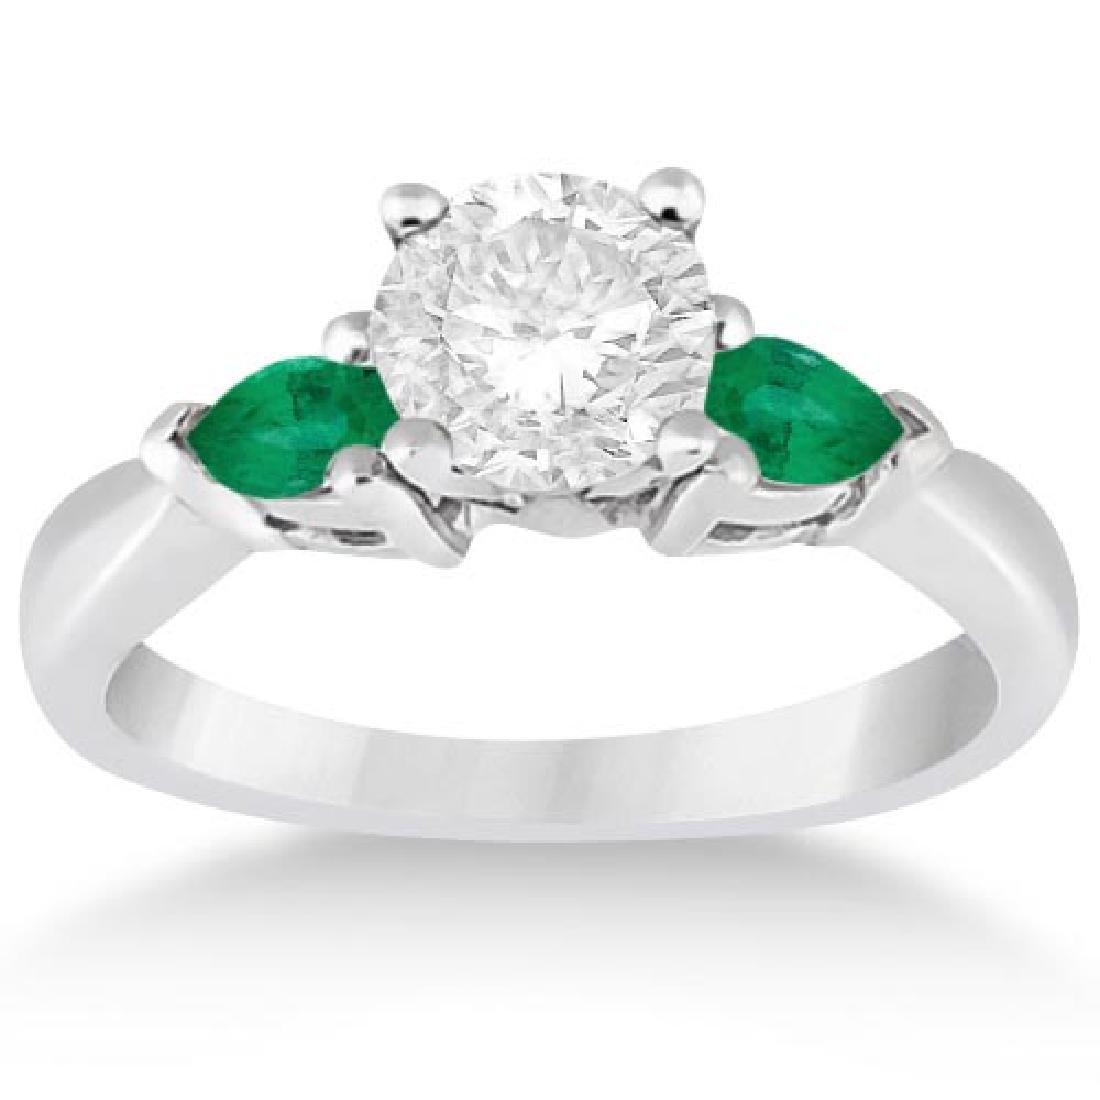 Pear Cut Three Stone Emerald Engagement Ring 14k White